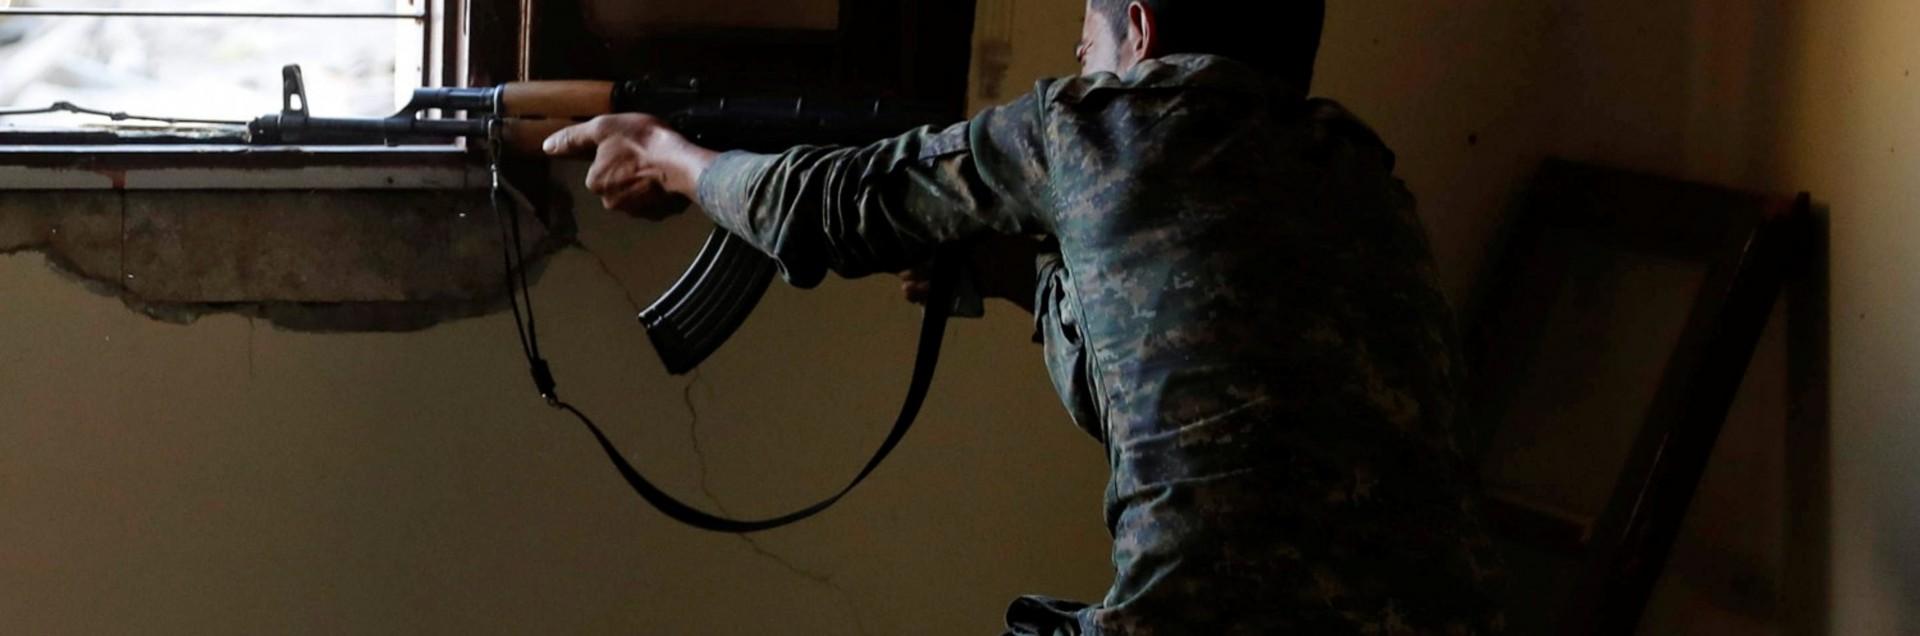 Raqqa, assalto finale